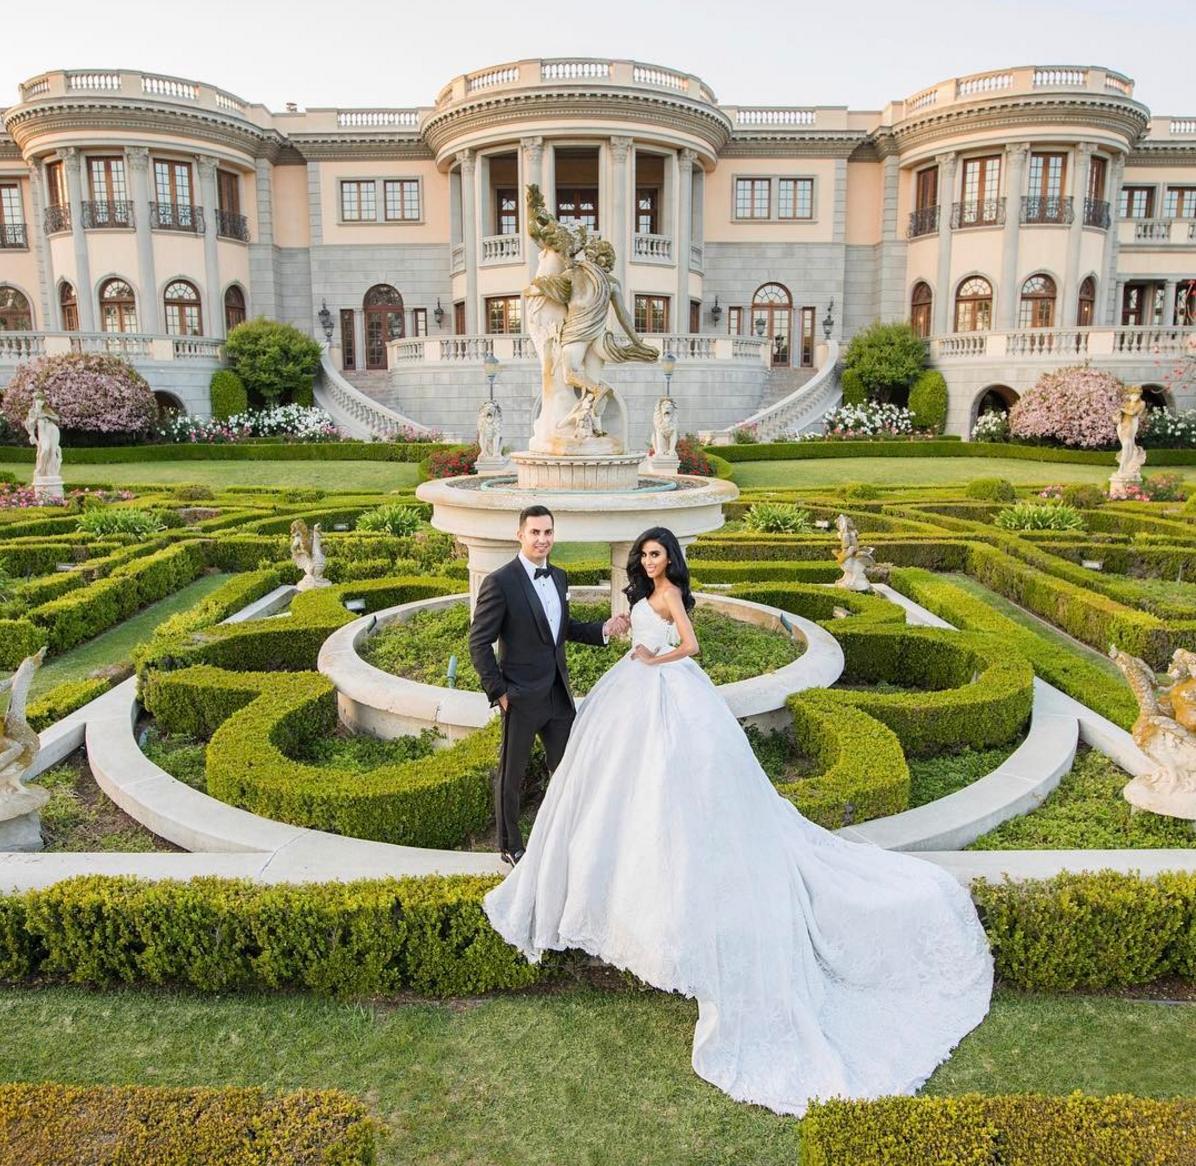 Celebrity Wedding Locations: Celebrity Wedding - Hosted By Wedding Estates